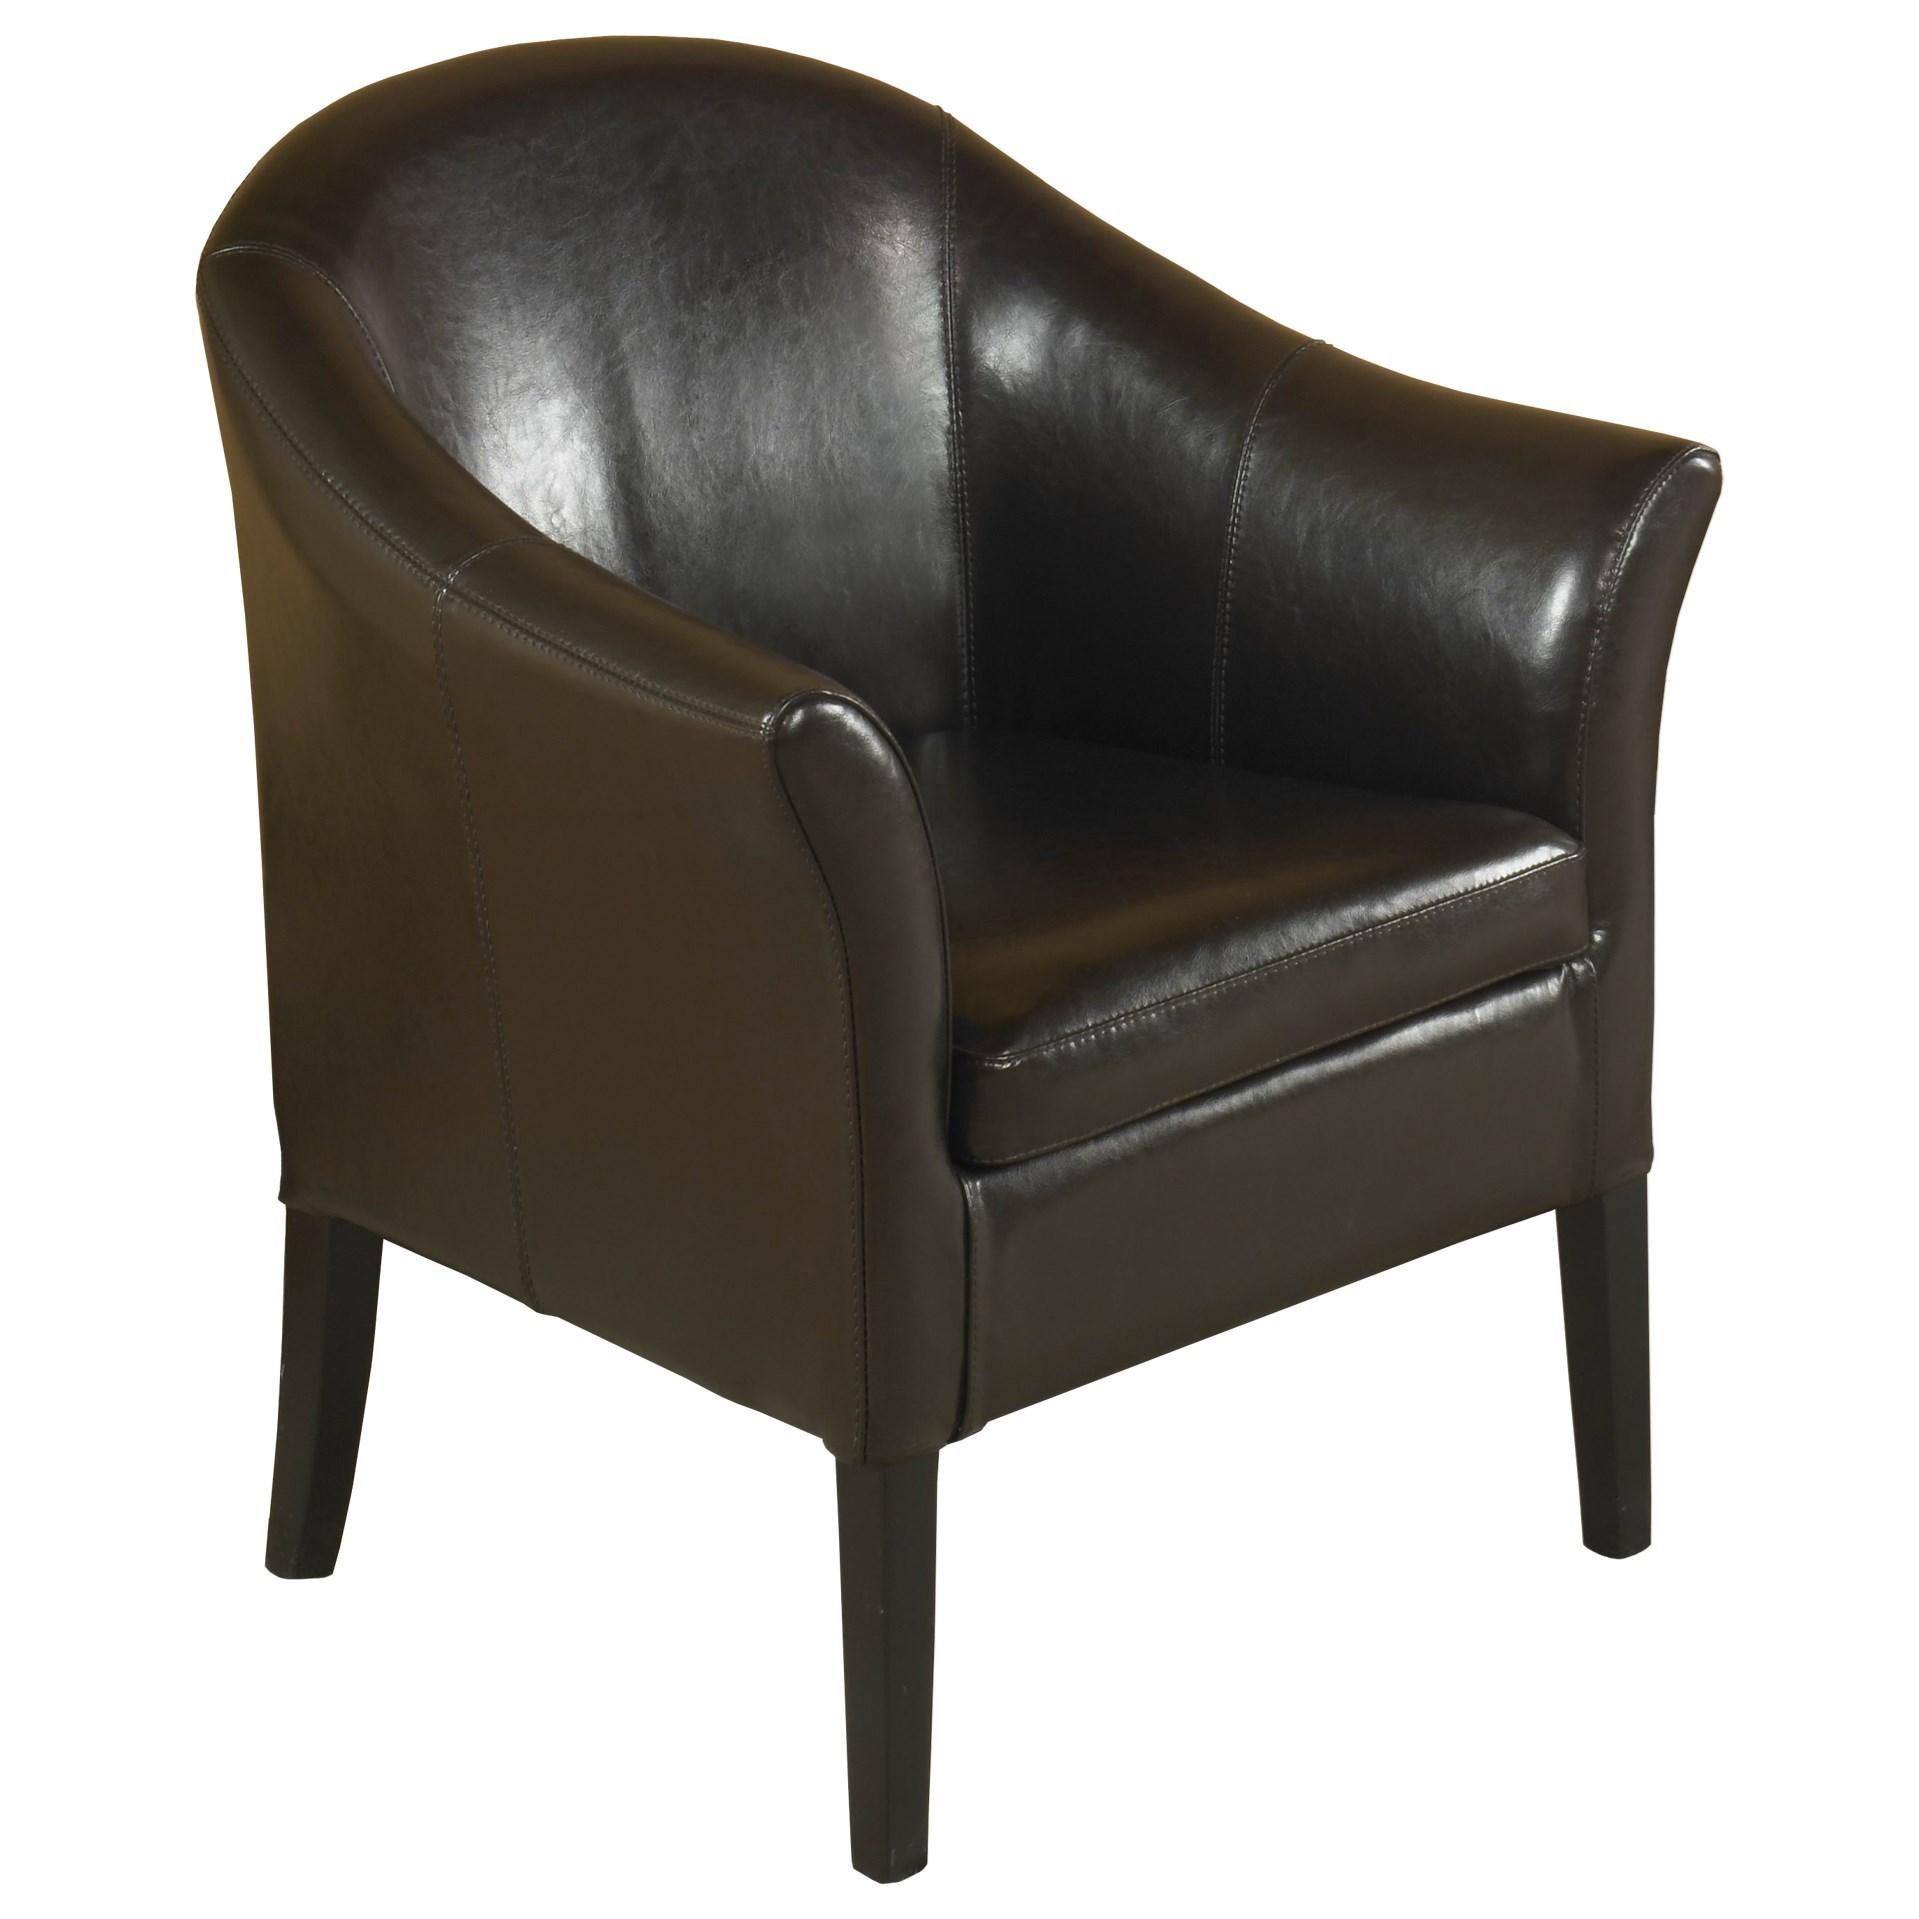 1404 Club Chair by Armen Living at Dream Home Interiors